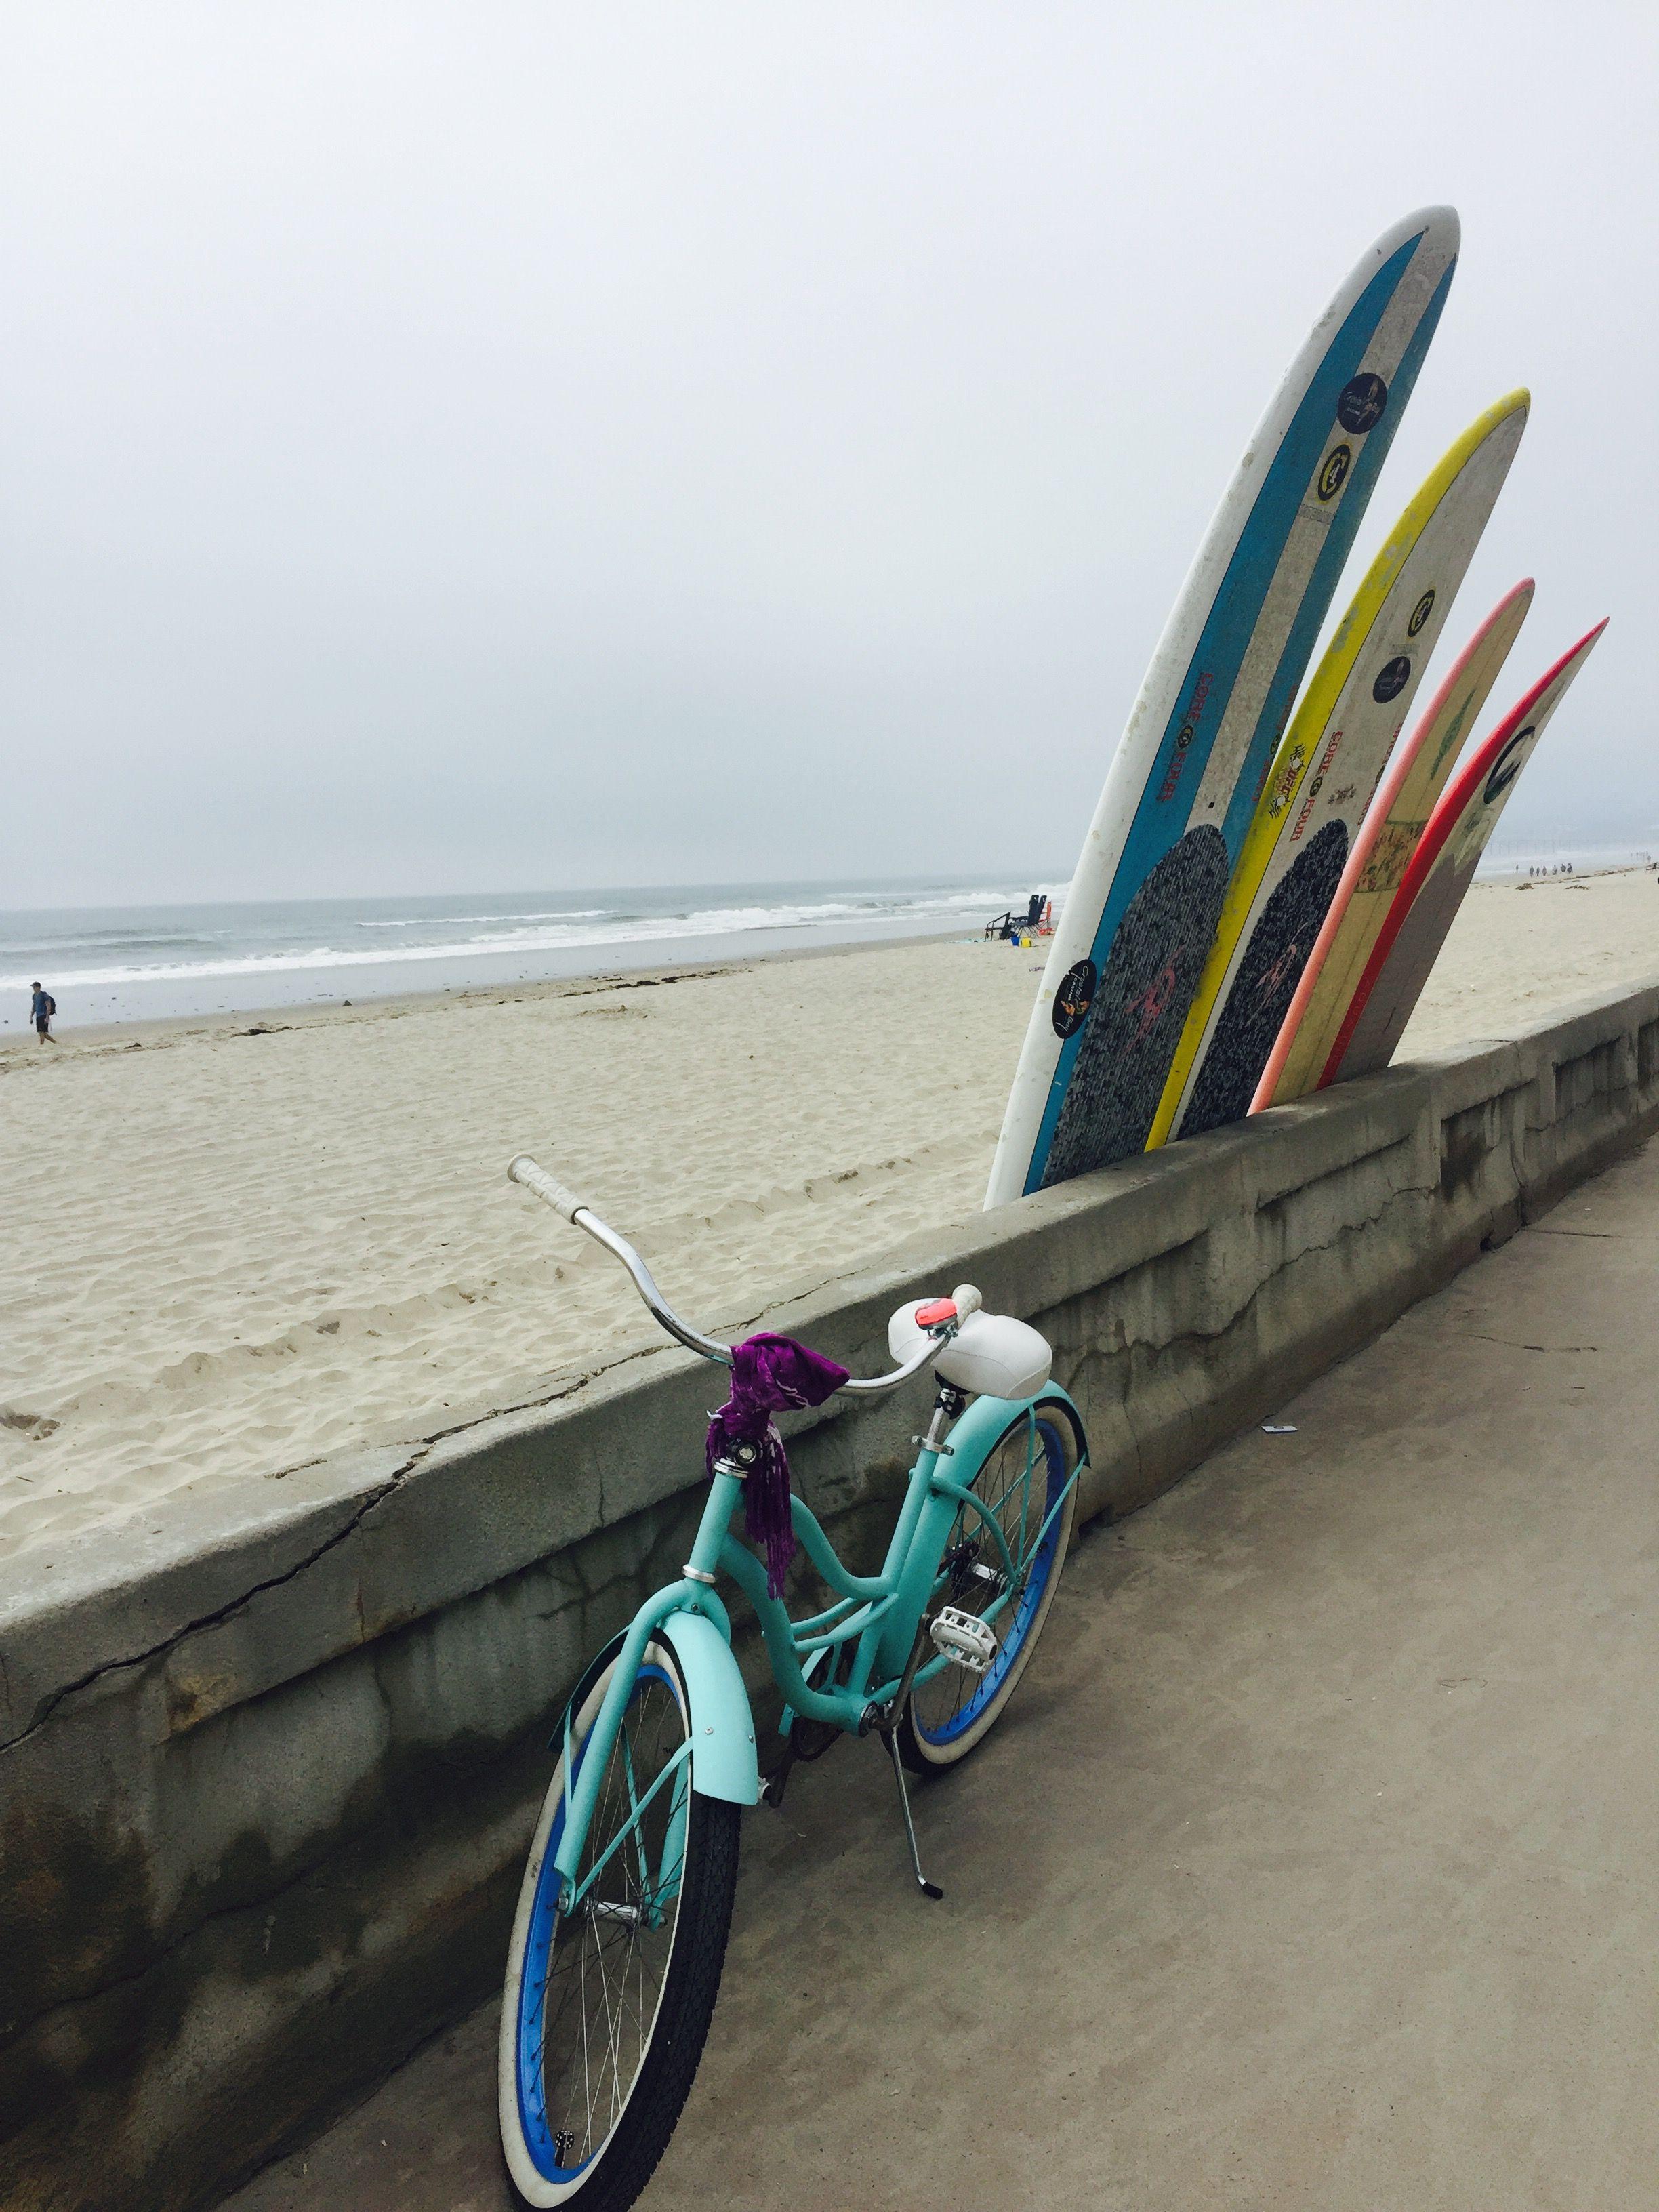 Mission Beach Boardwalk in San Diego